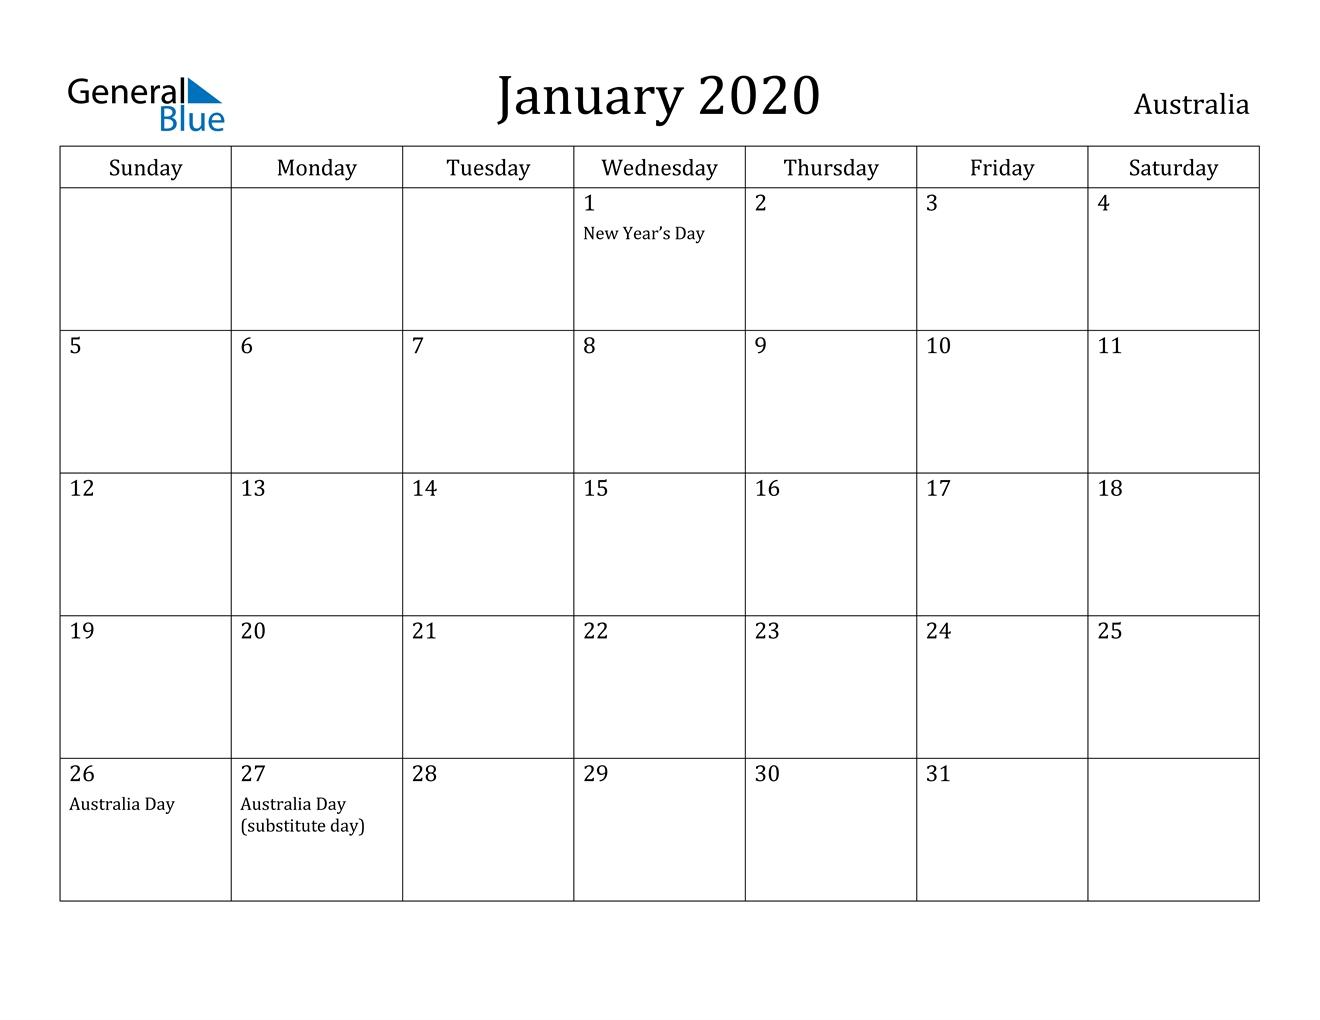 January 2020 Calendar - Australia  Yearly Calendars Australia